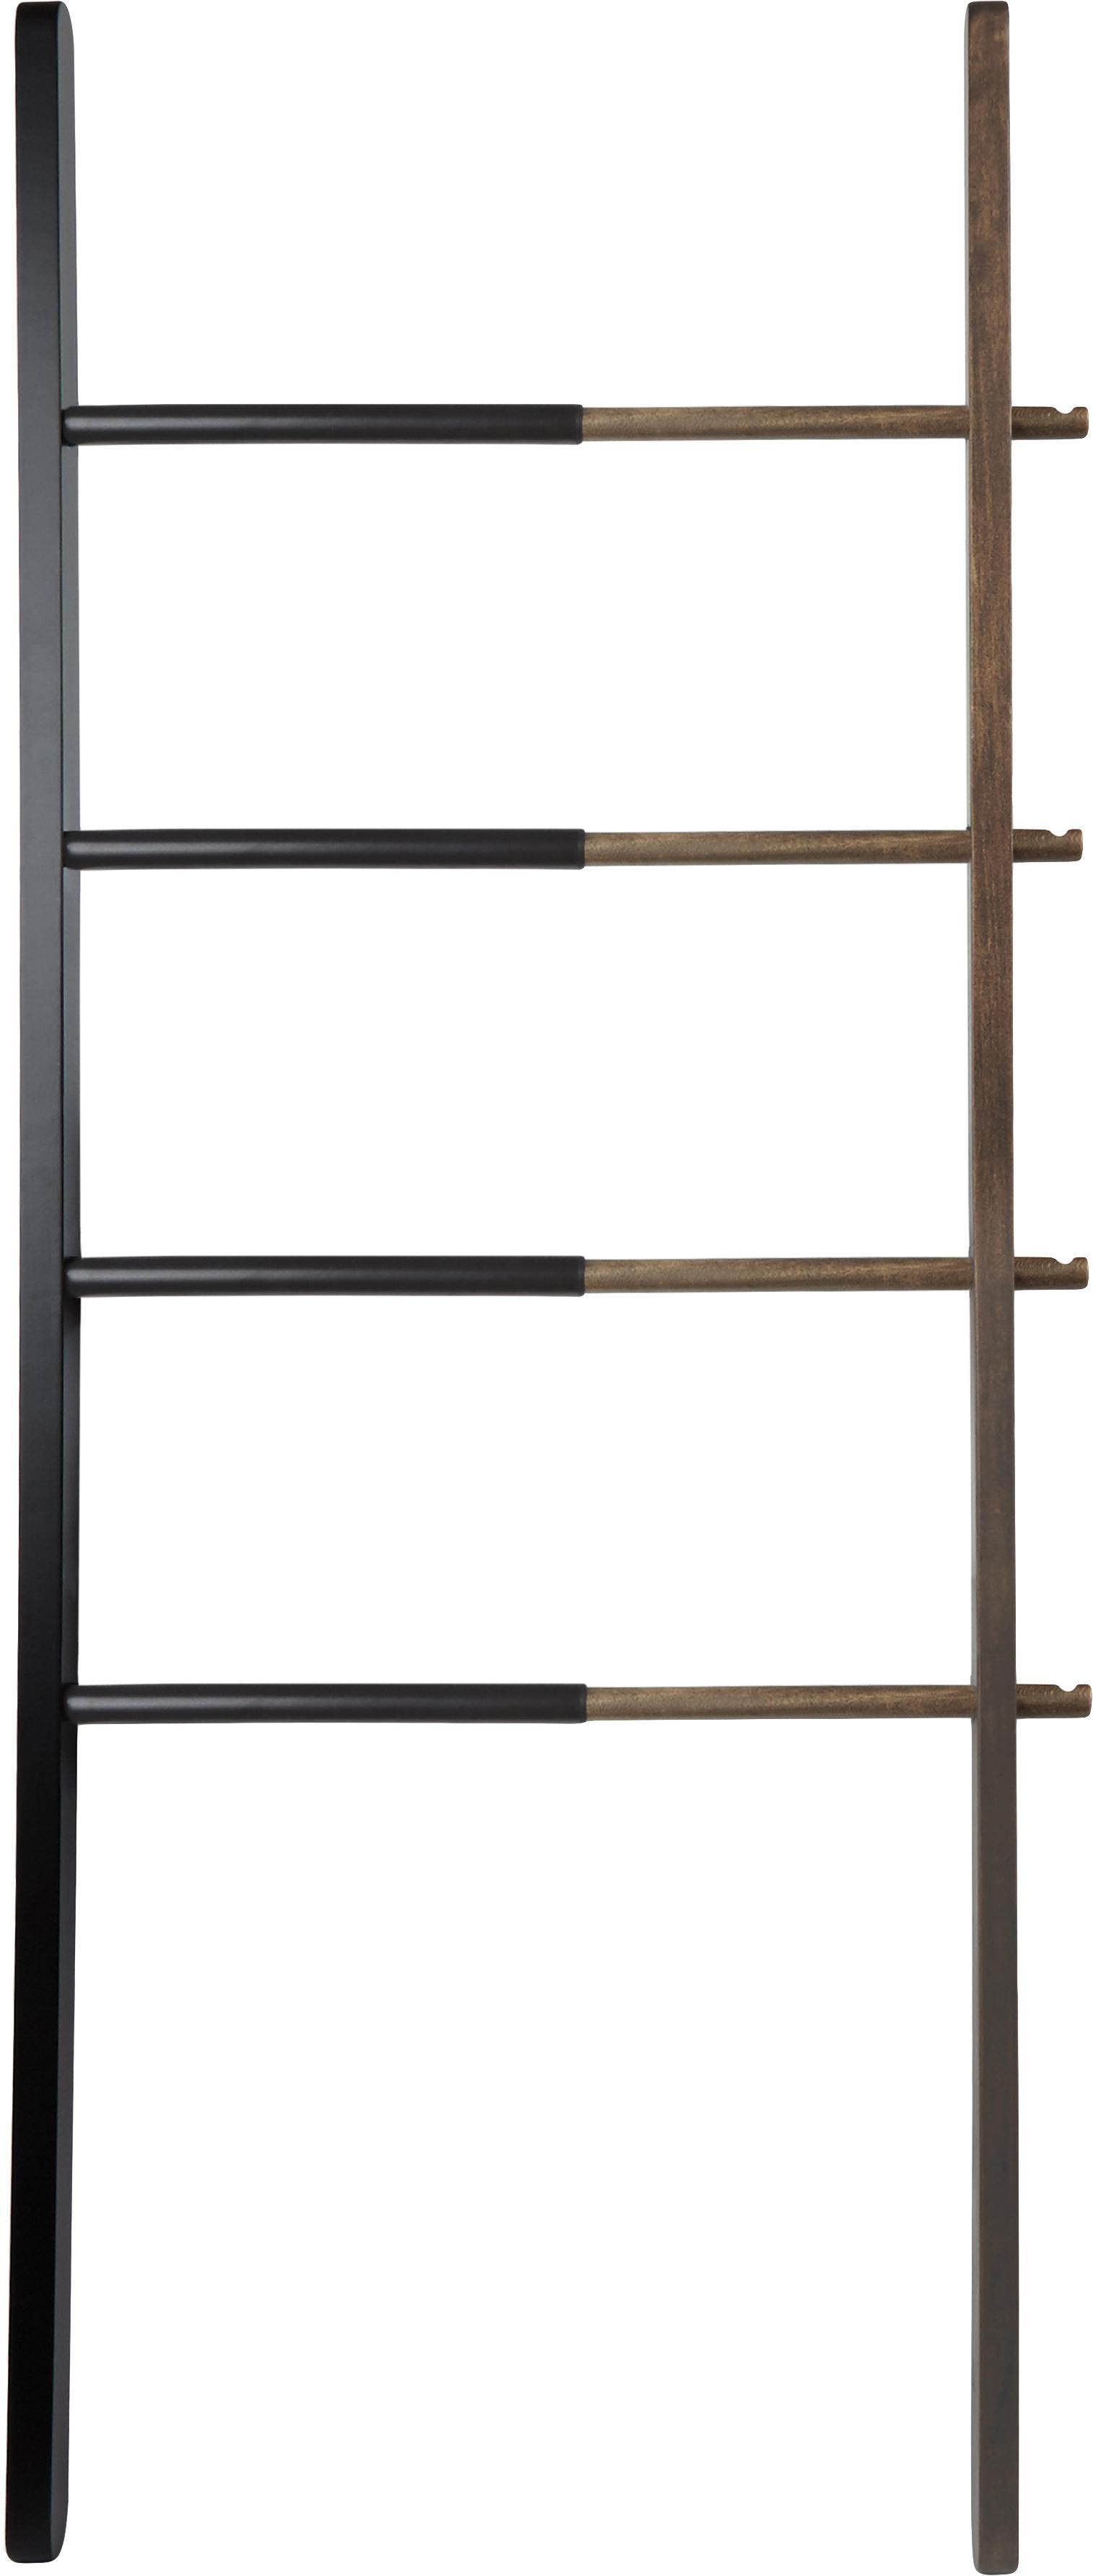 Design ladderrek Hub, Gebeitst essenhout, gelakt staal, Zwart, donkerbruin, 67 x 152 cm